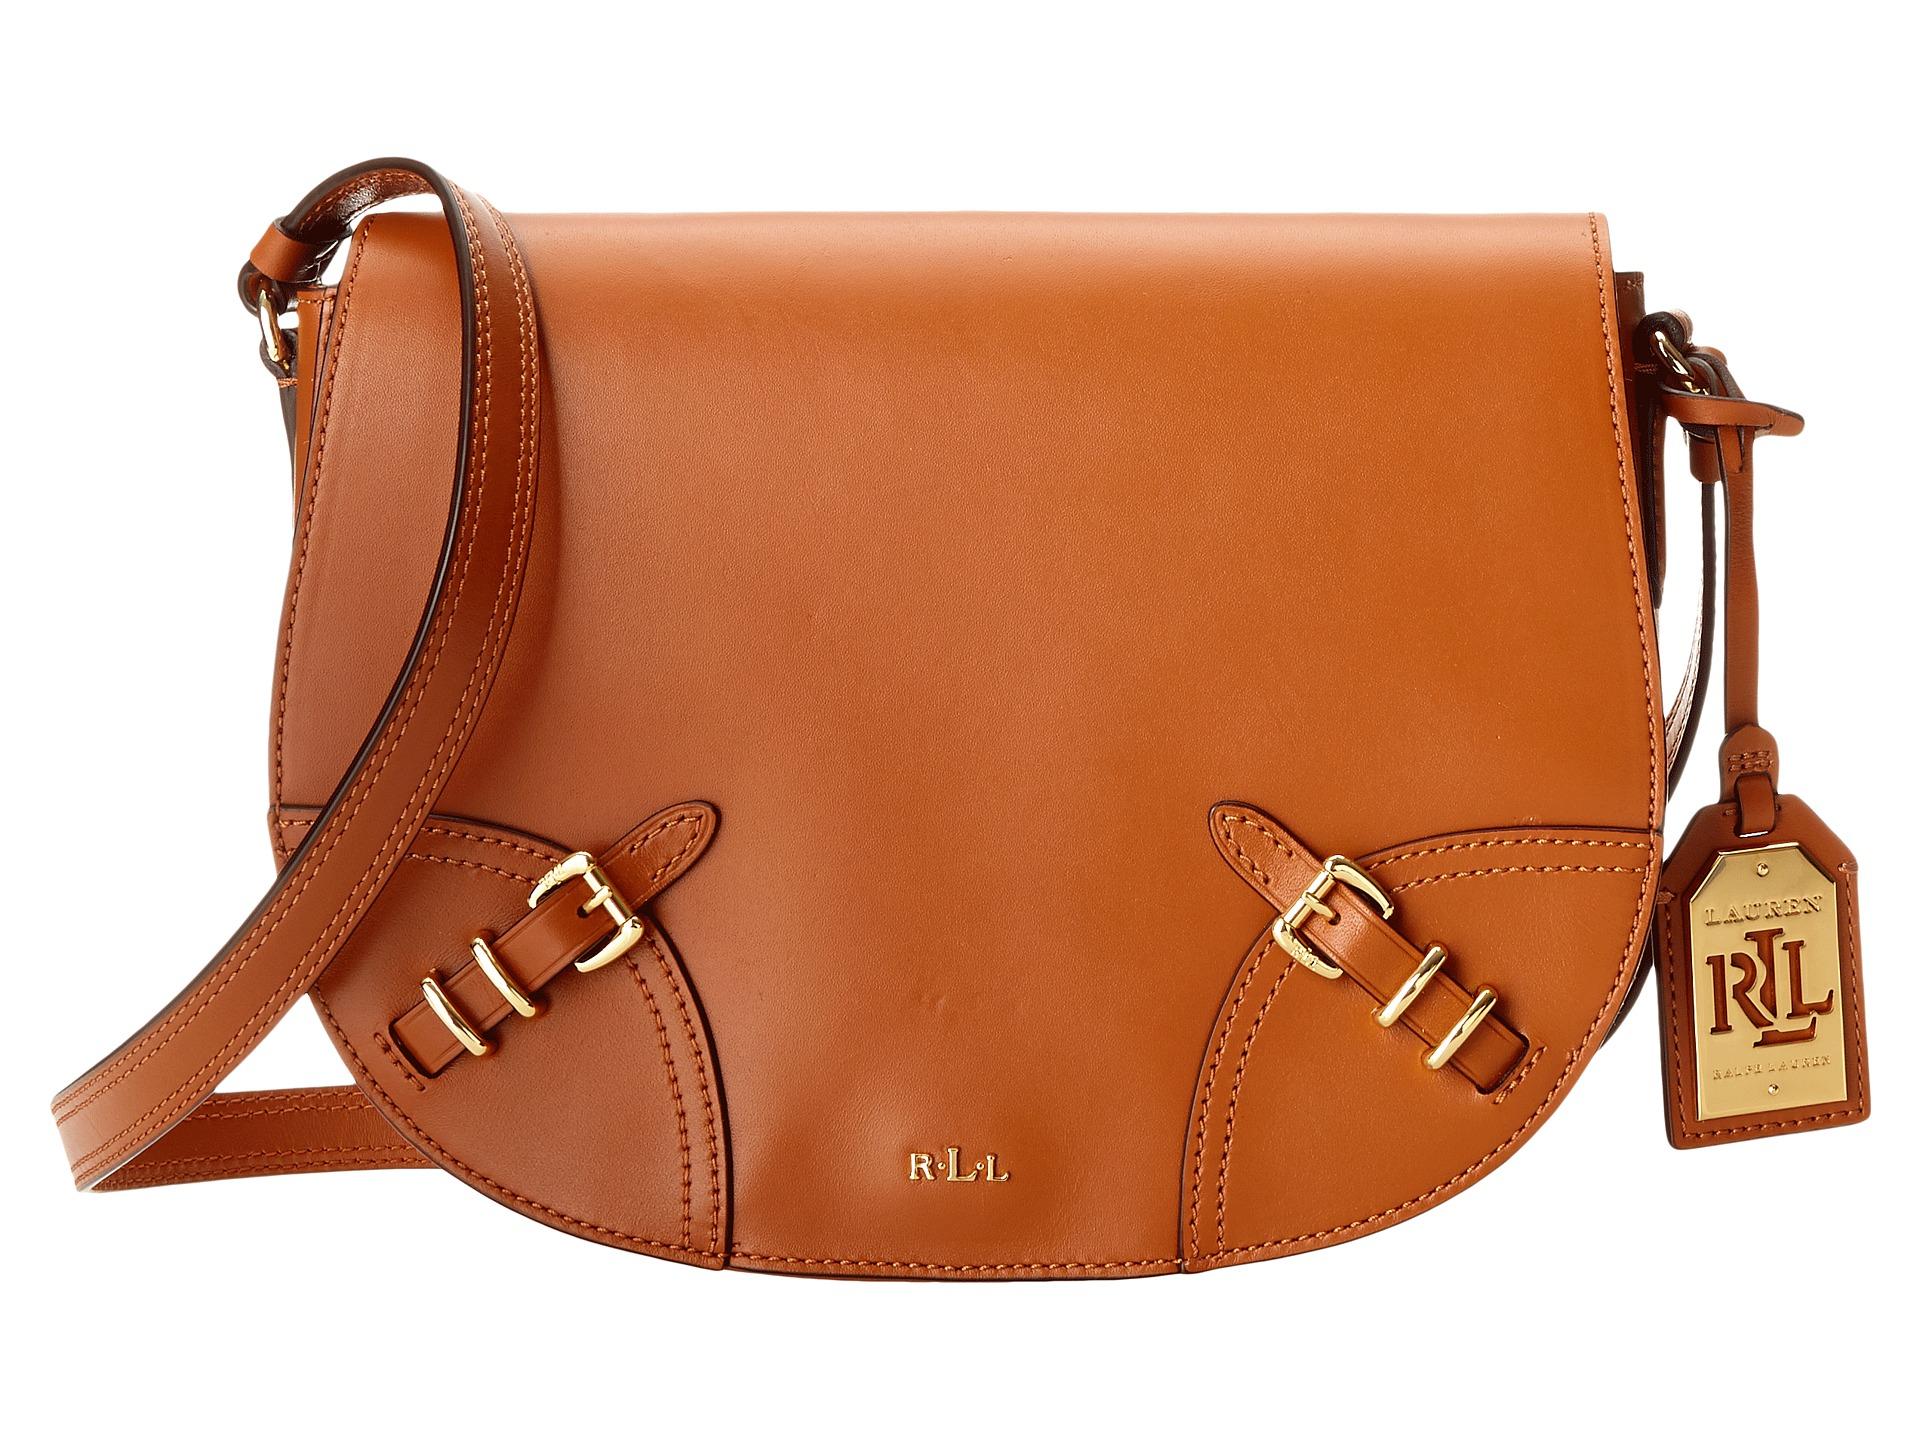 promo code for ralph lauren crossbody saddle bag 072f4 9c8a3 5549c58d24